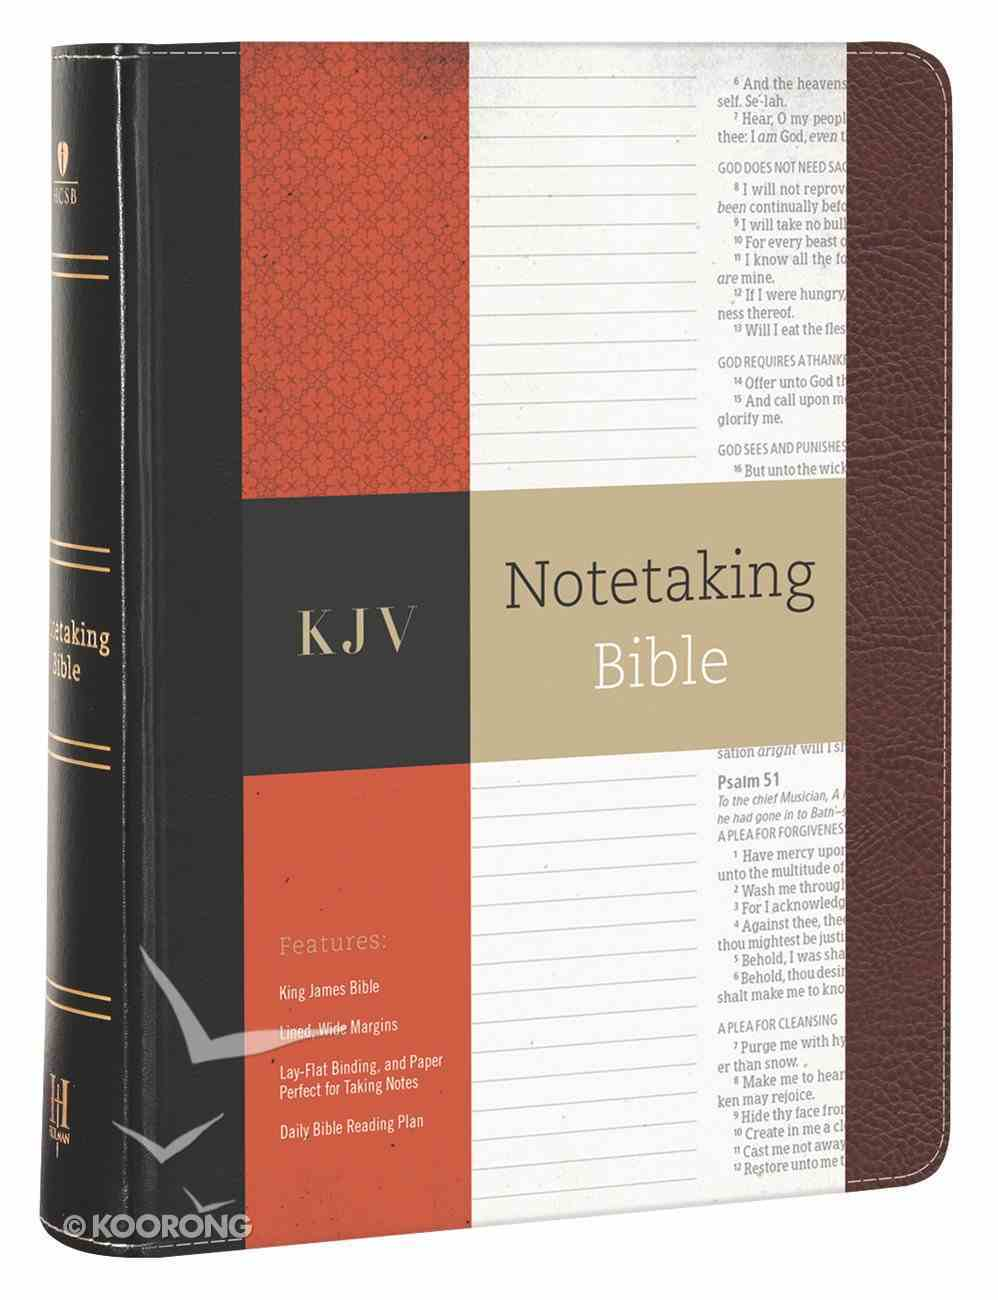 KJV Notetaking Bible Black/Brown Bonded Leather